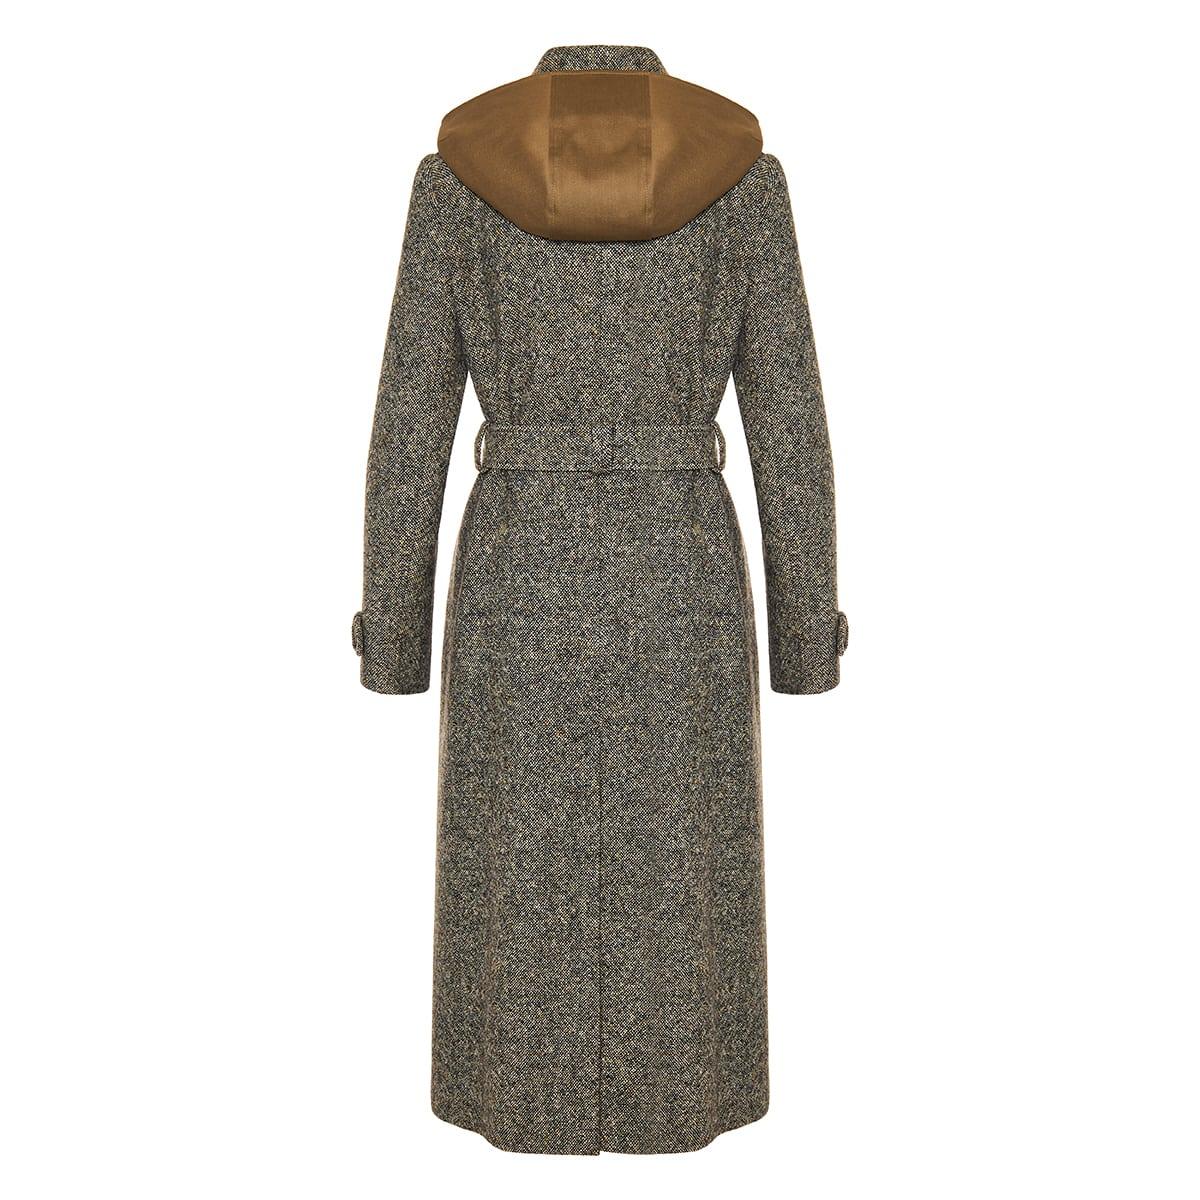 Silk wool tweed trench coat